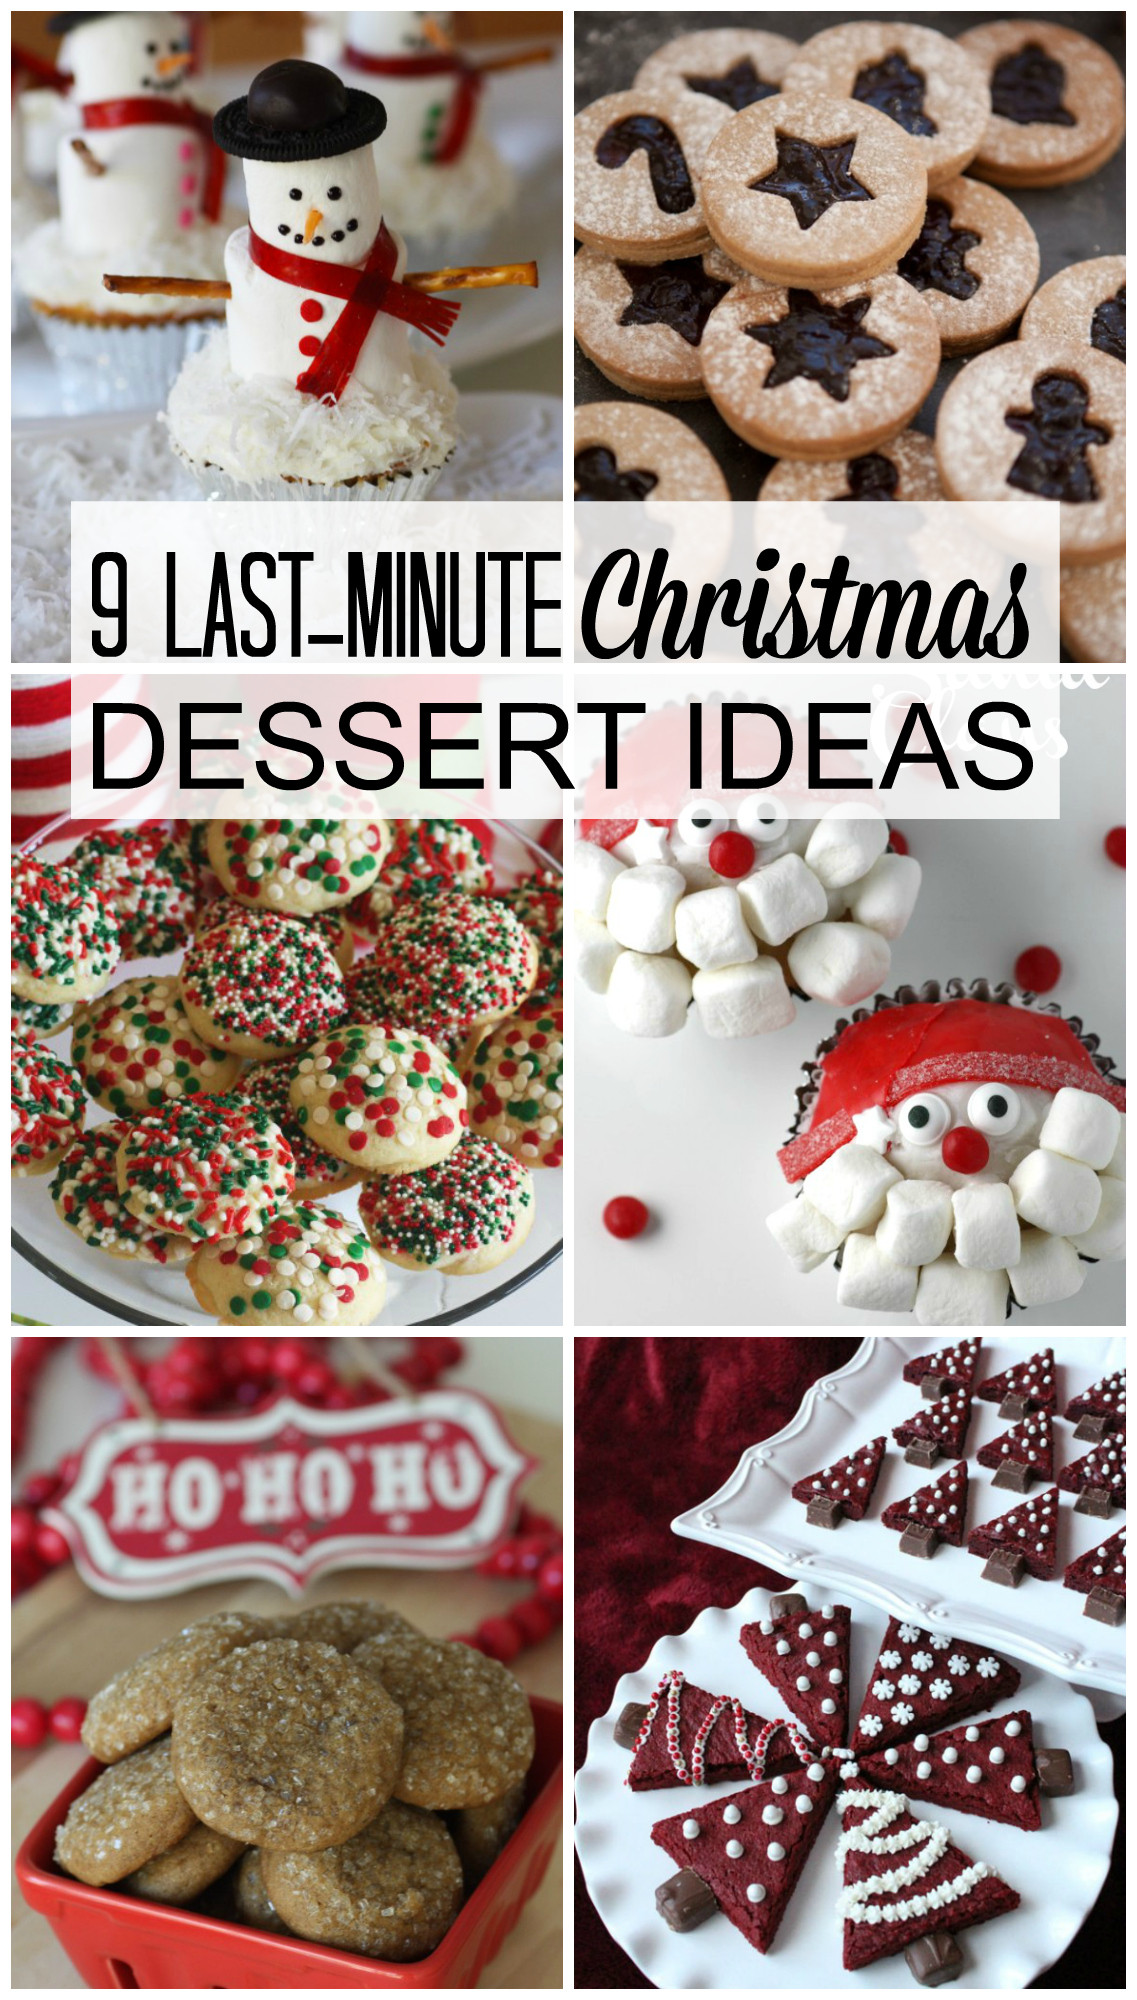 Christmas Dessert Ideas For Parties  9 Last Minute Christmas Dessert Ideas